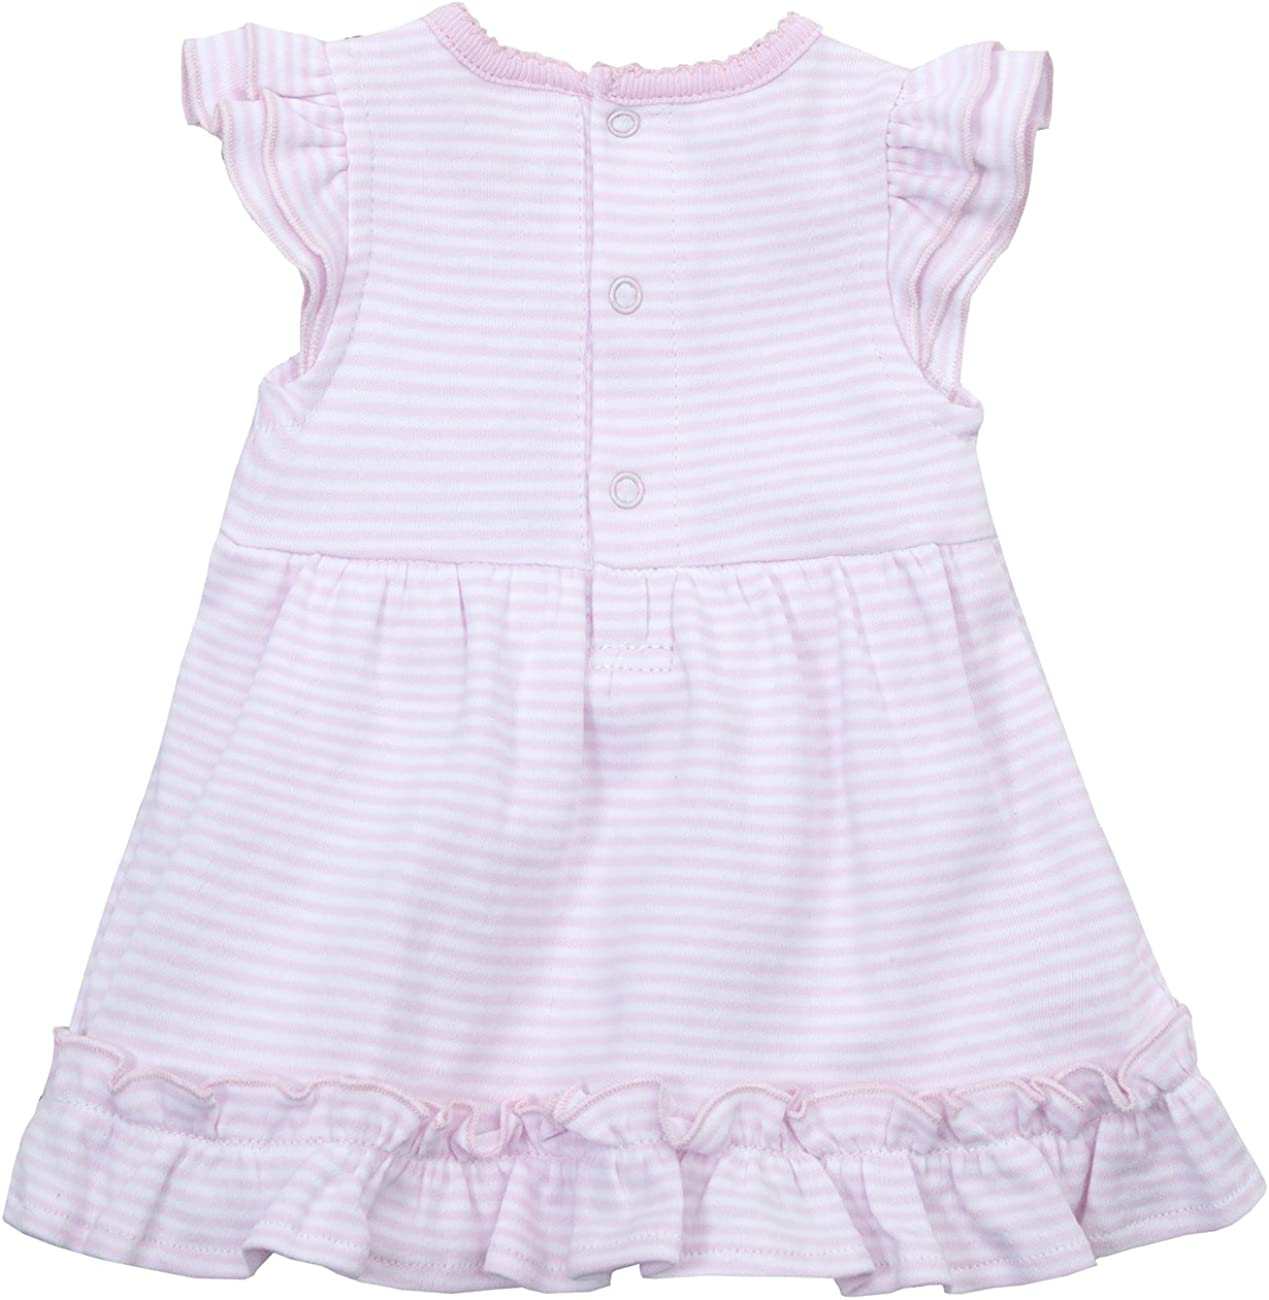 Babytown Tiny Baby Girls Bodysuit Dress 100/% Cotton Premature